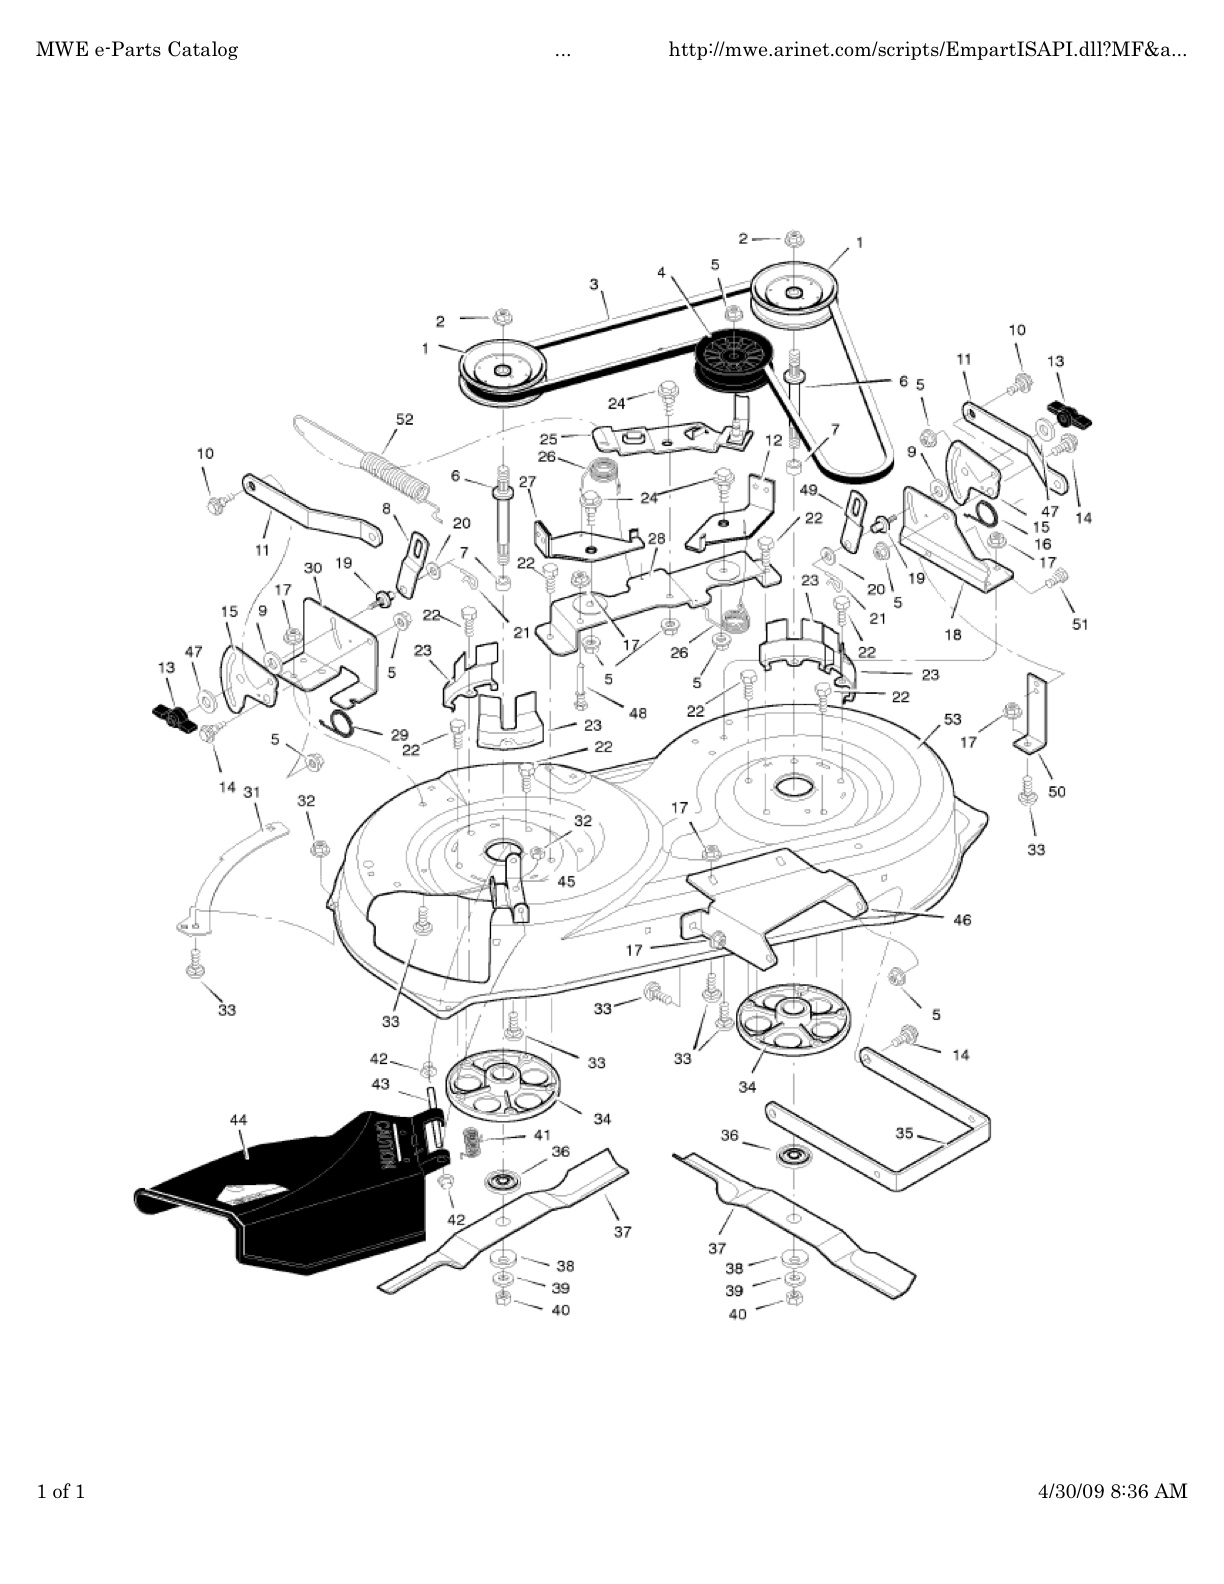 Honda 250ex Rear Axle Diagram Schematics Data Wiring Diagrams Engine Imageresizertool Com 2001 300ex